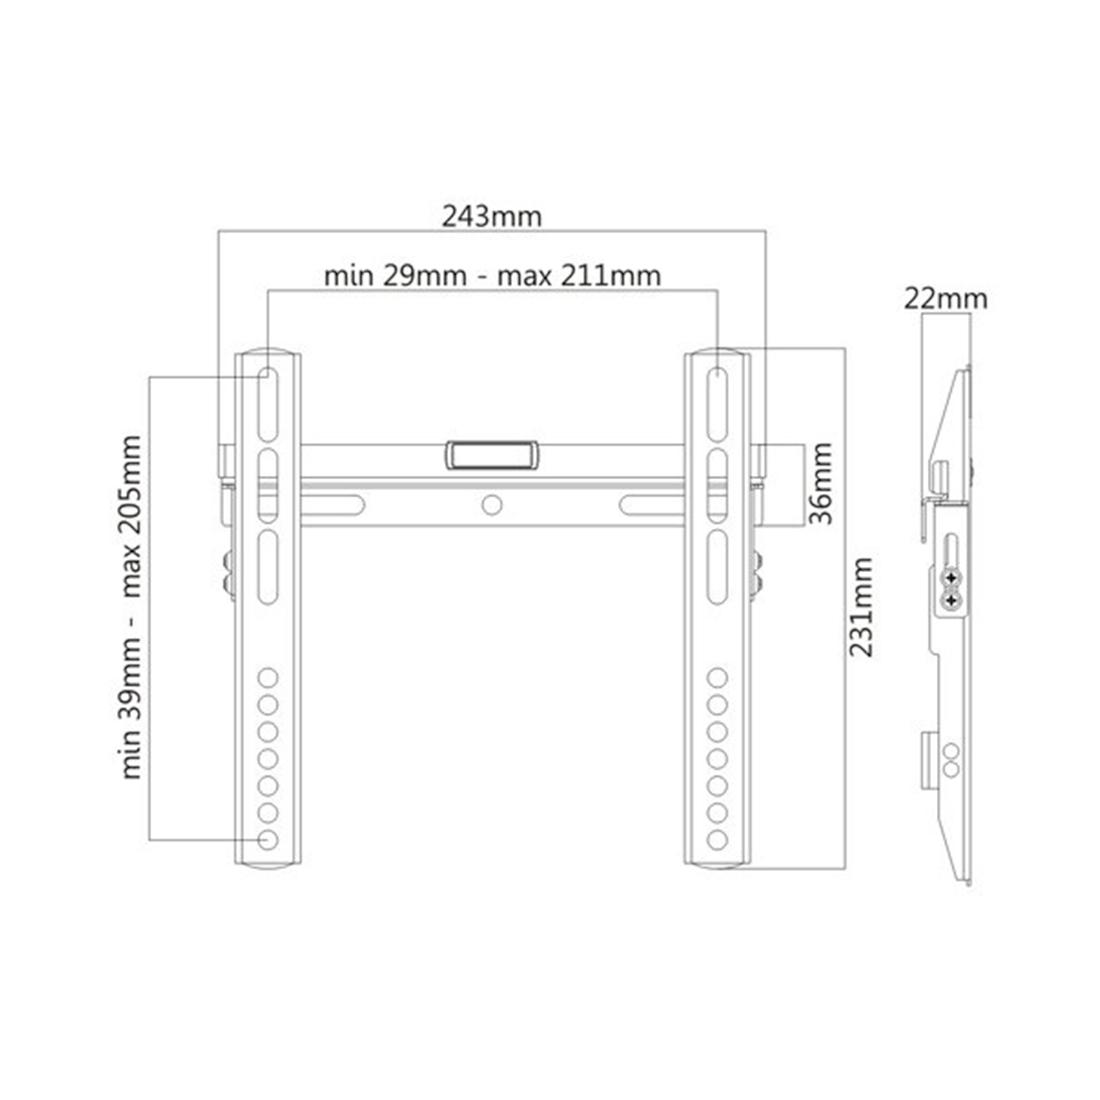 Кронштейн Brateck LP43-22 для ТВ и мониторов, 23